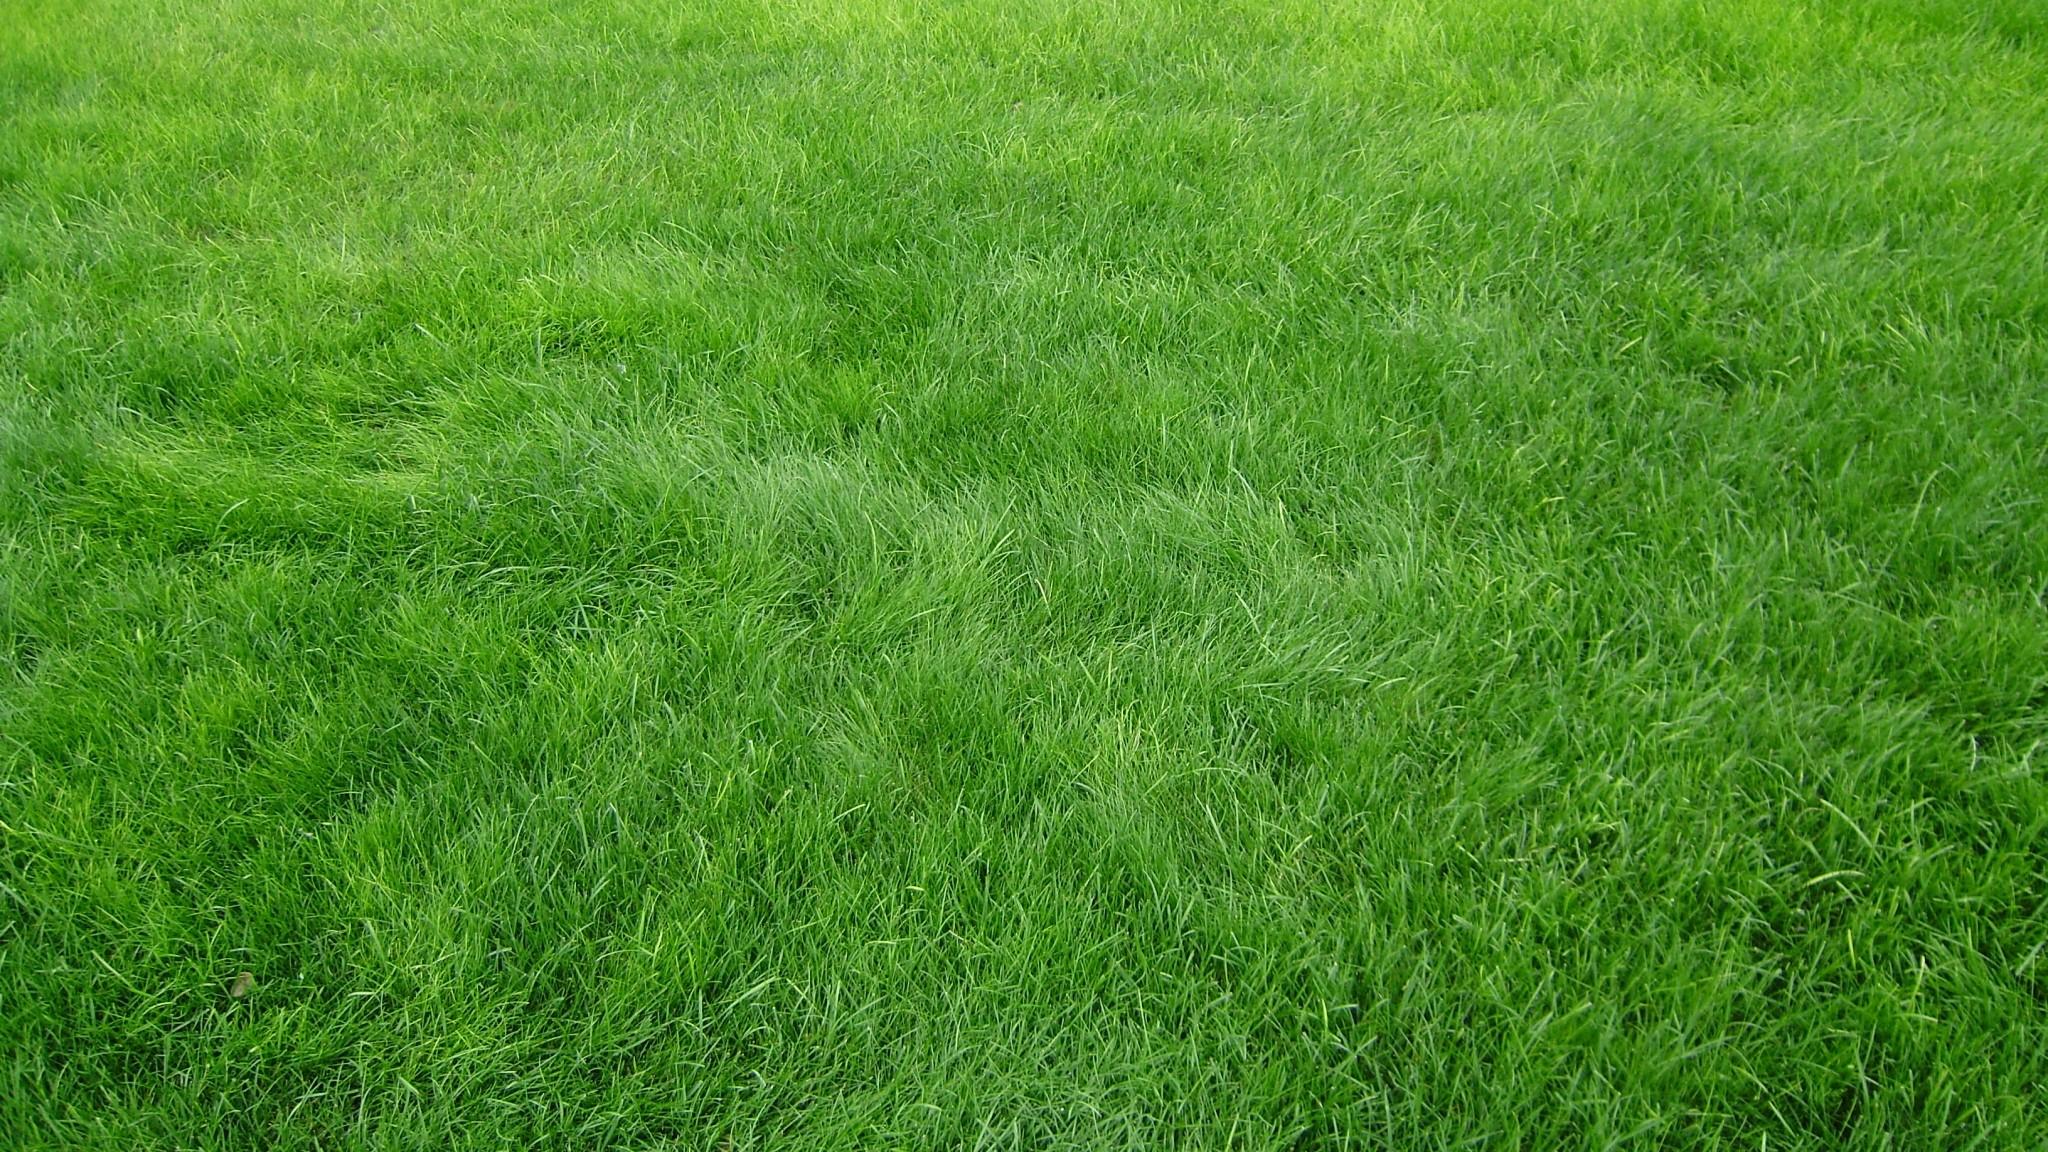 Grass Background HD